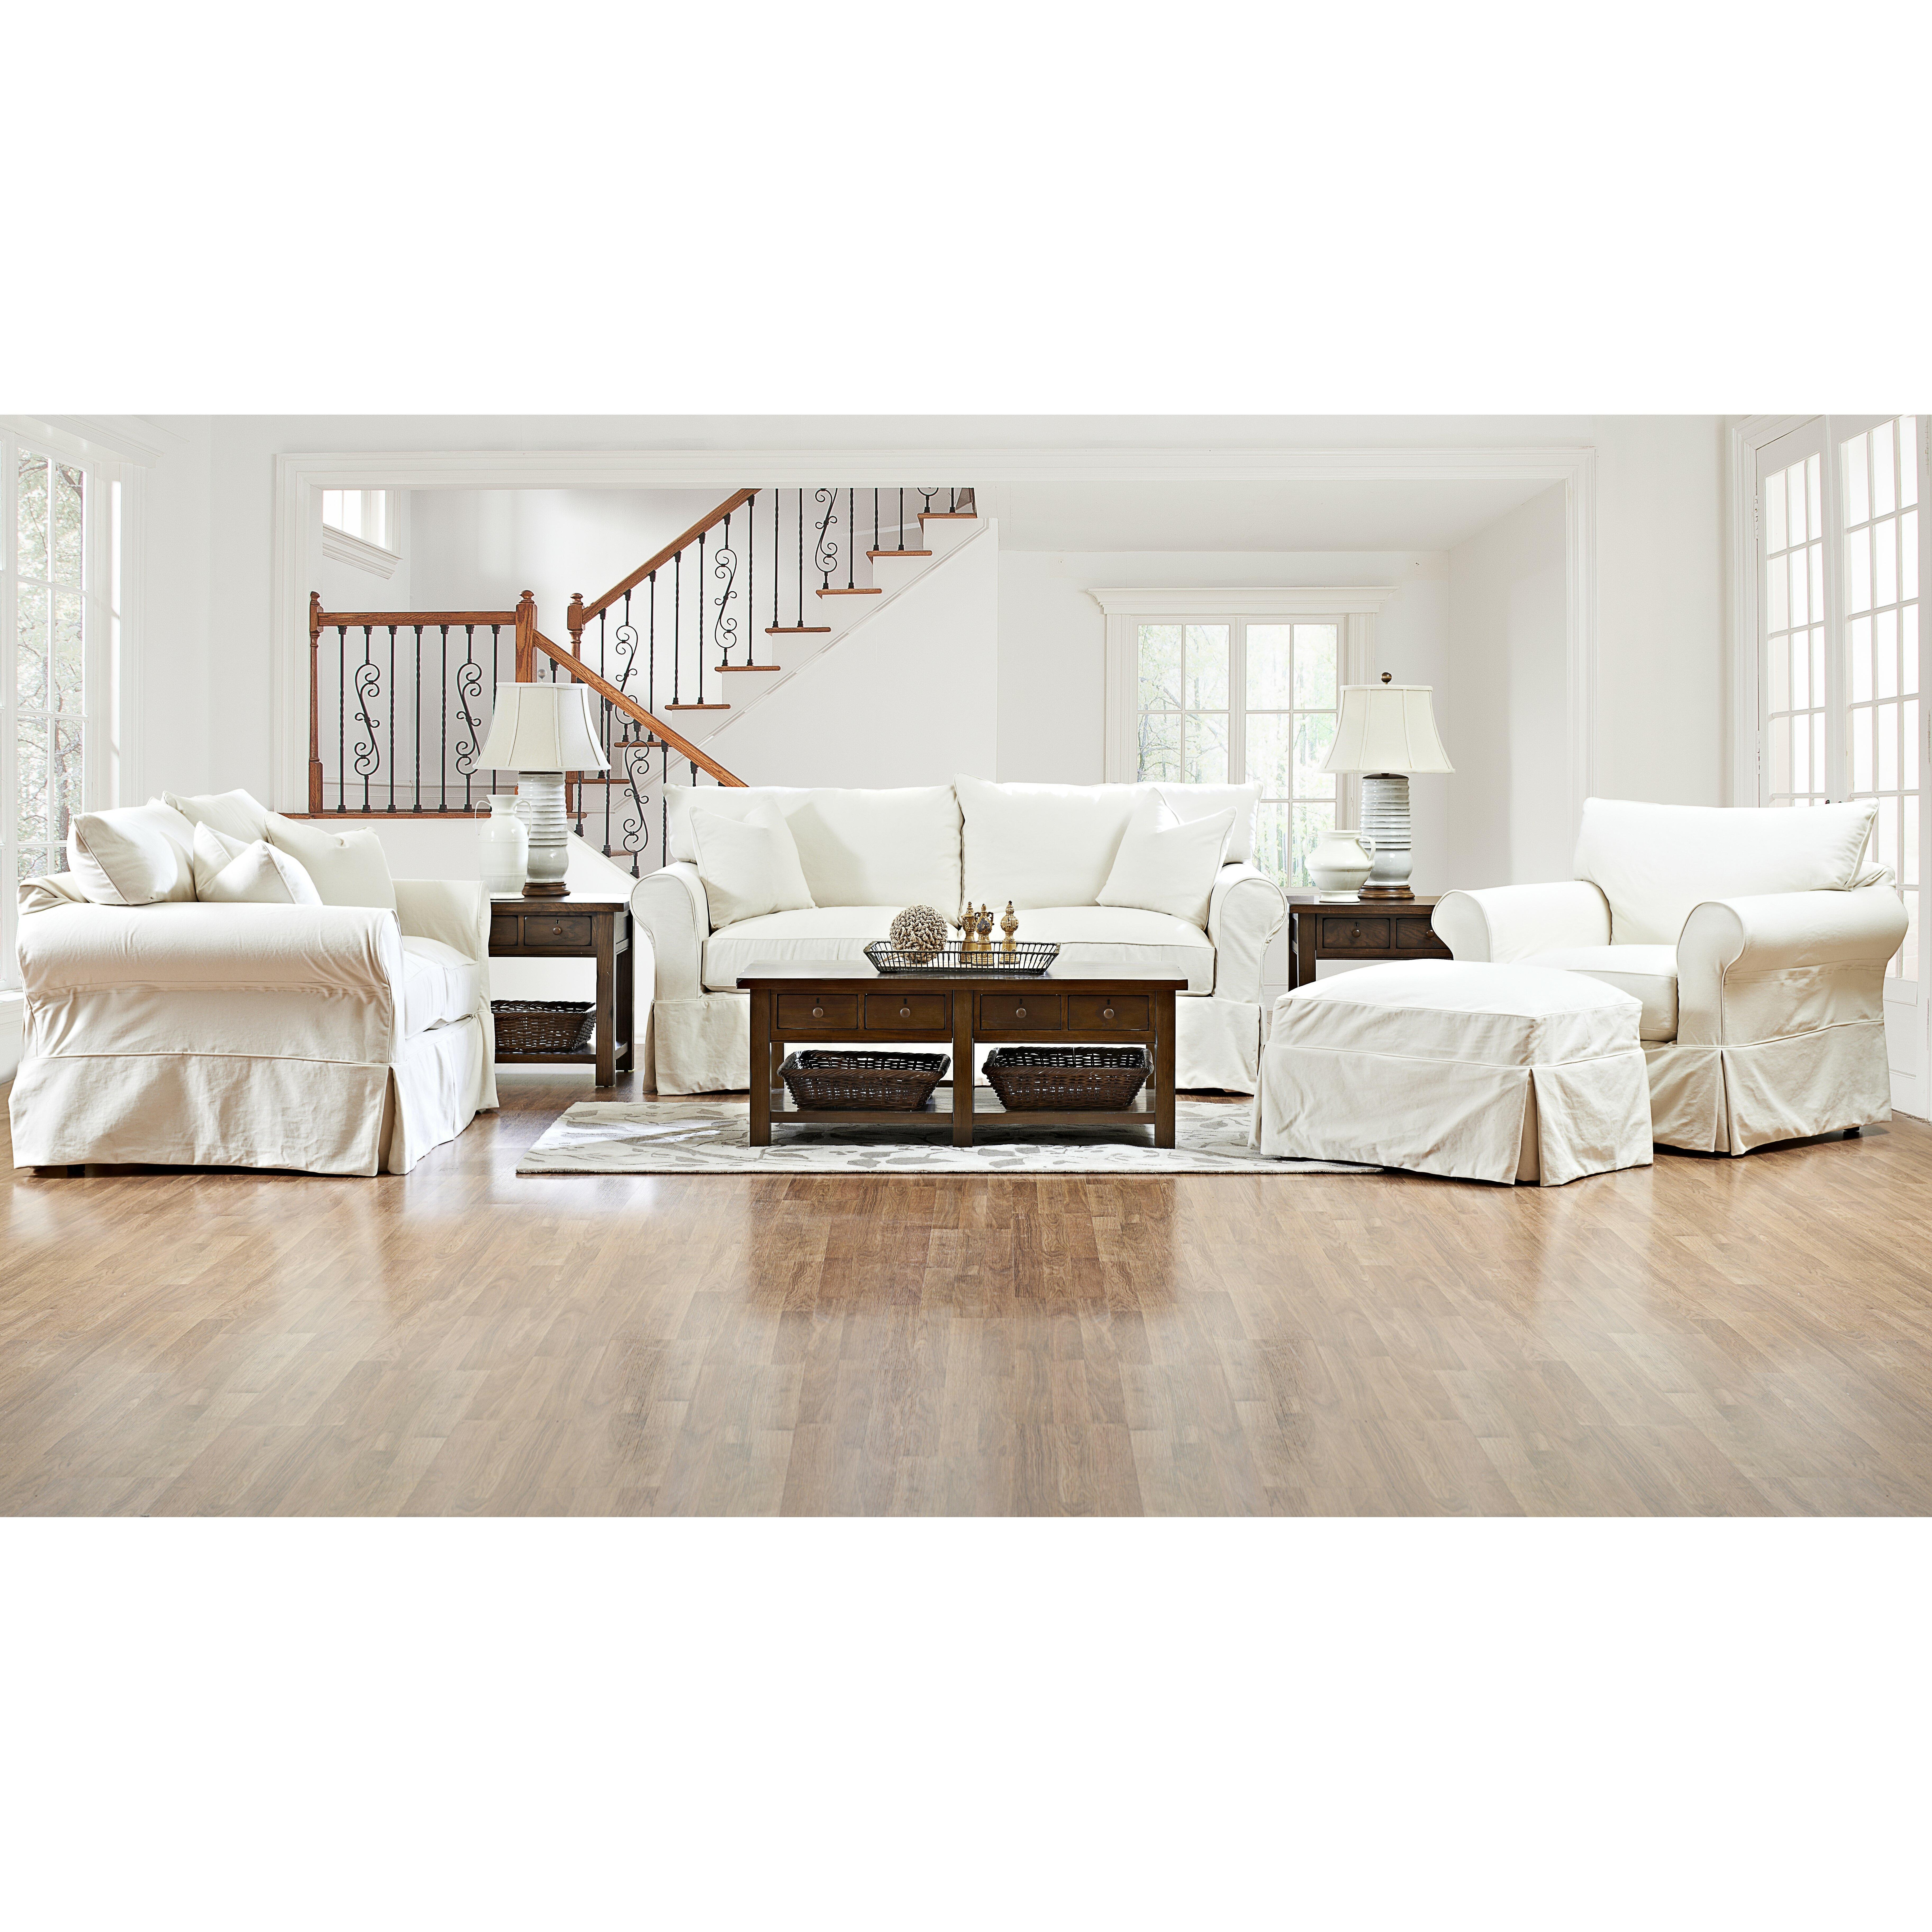 Wayfair Custom Upholstery Felicity Sleeper Sofa & Reviews ...